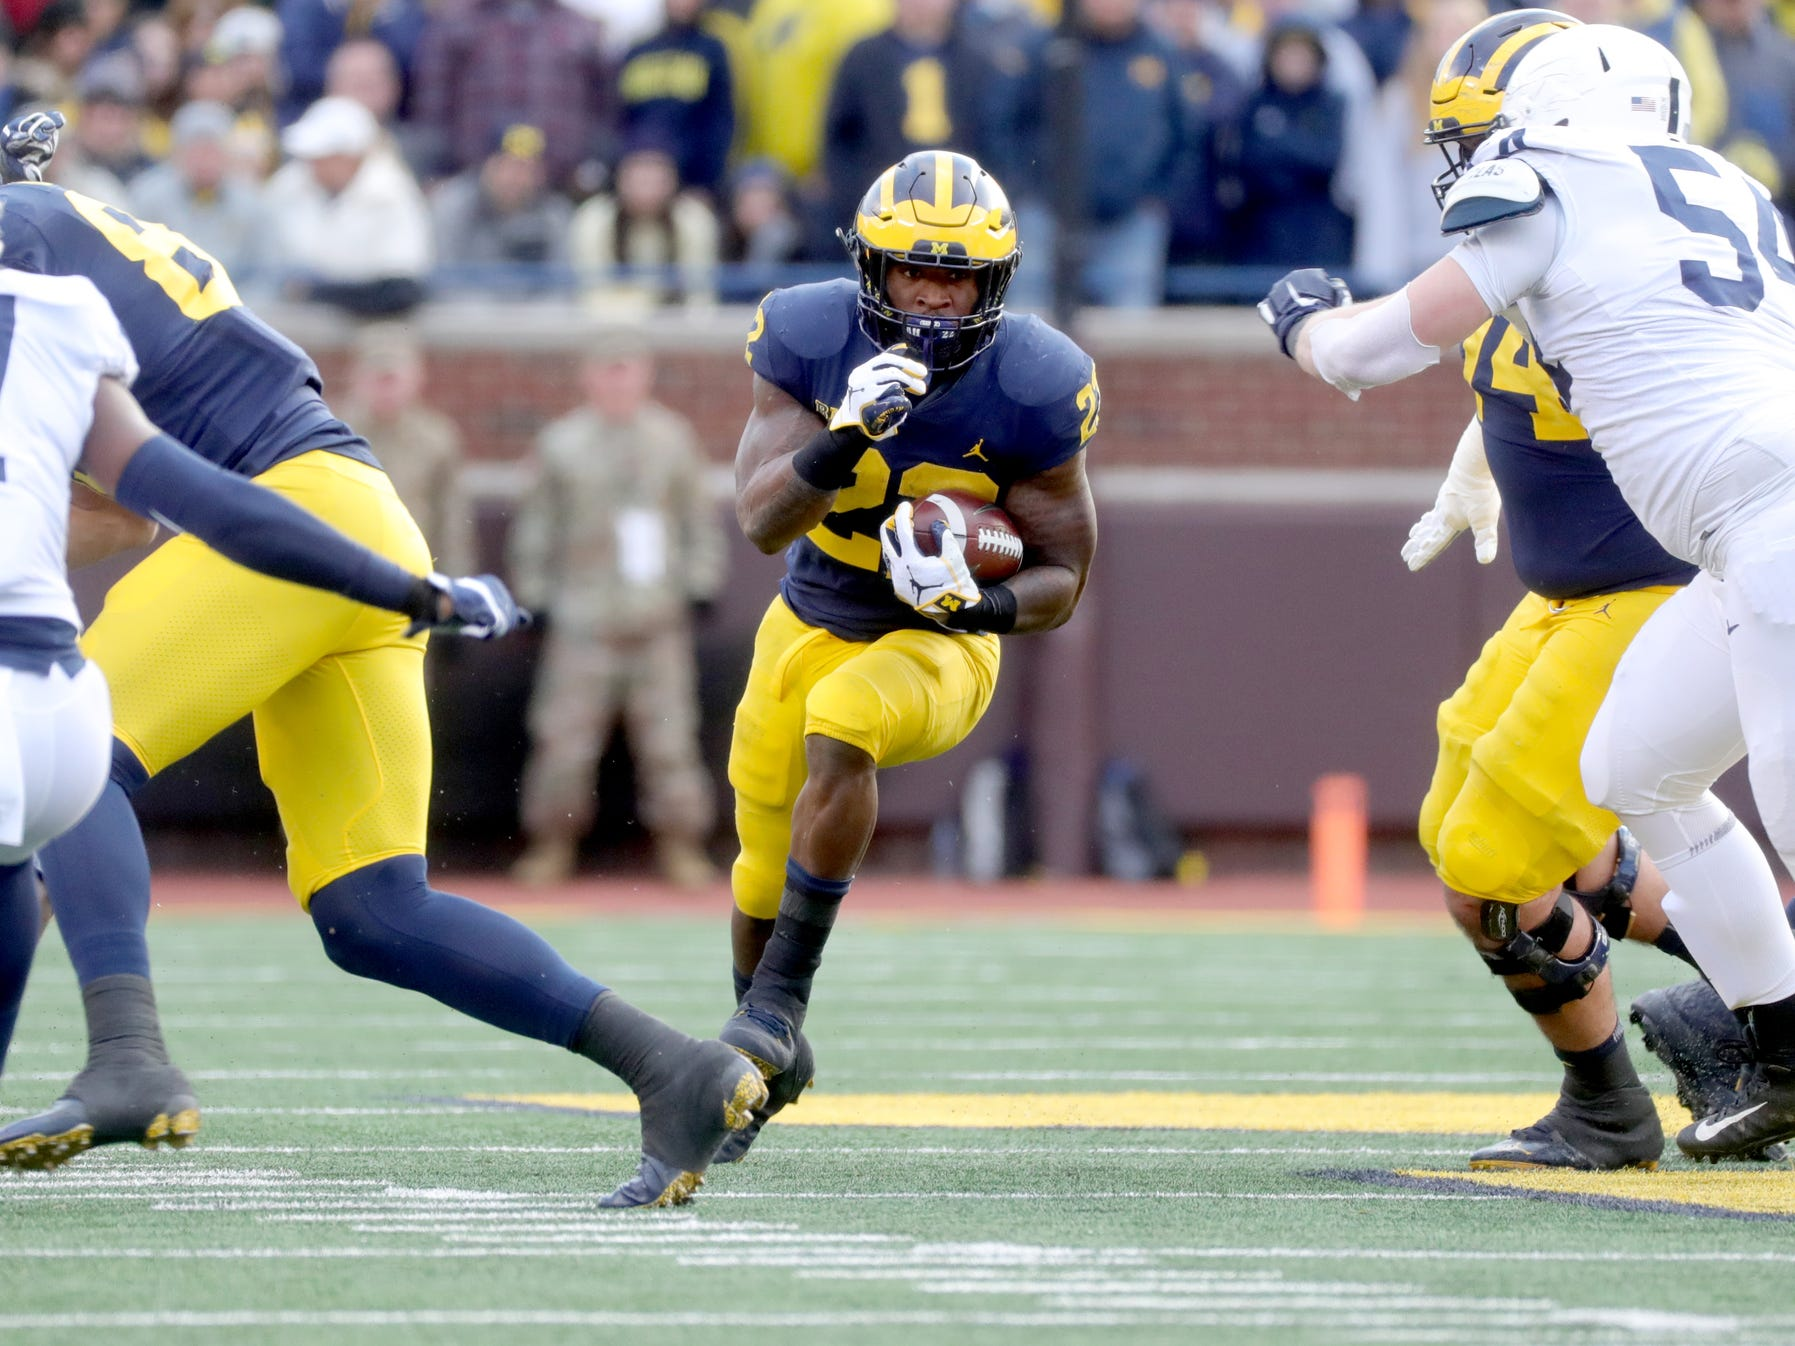 Michigan's Karan Higdon runs the ball against Penn State during the first half Saturday, November 3, 2018 at Michigan Stadium in Ann Arbor.